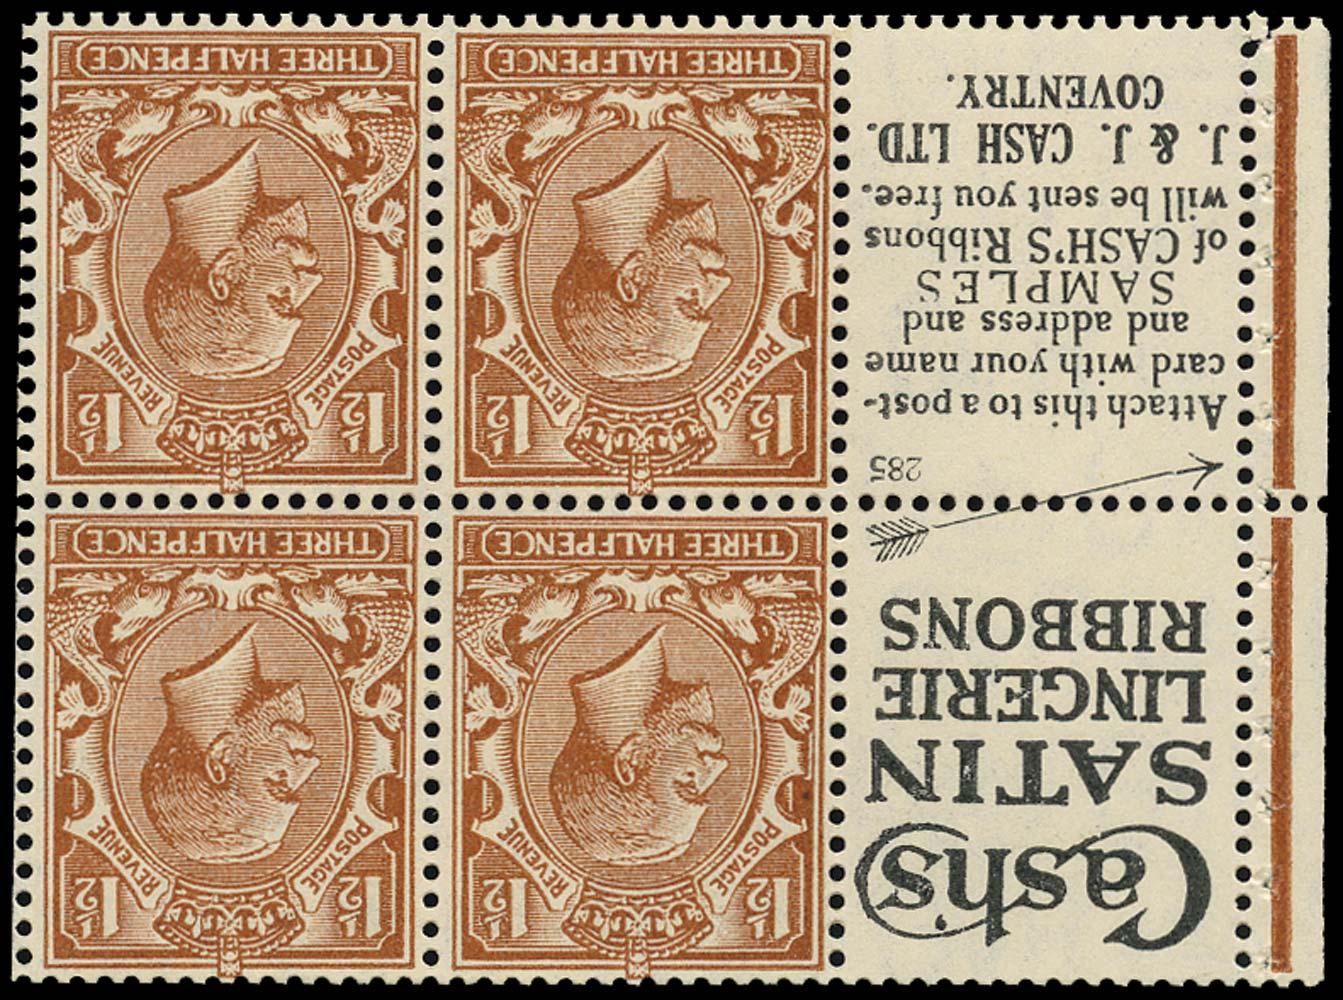 GB 1924  SG420dw Mint Booklet Pane (Wmk. Inverted) Advert (90)